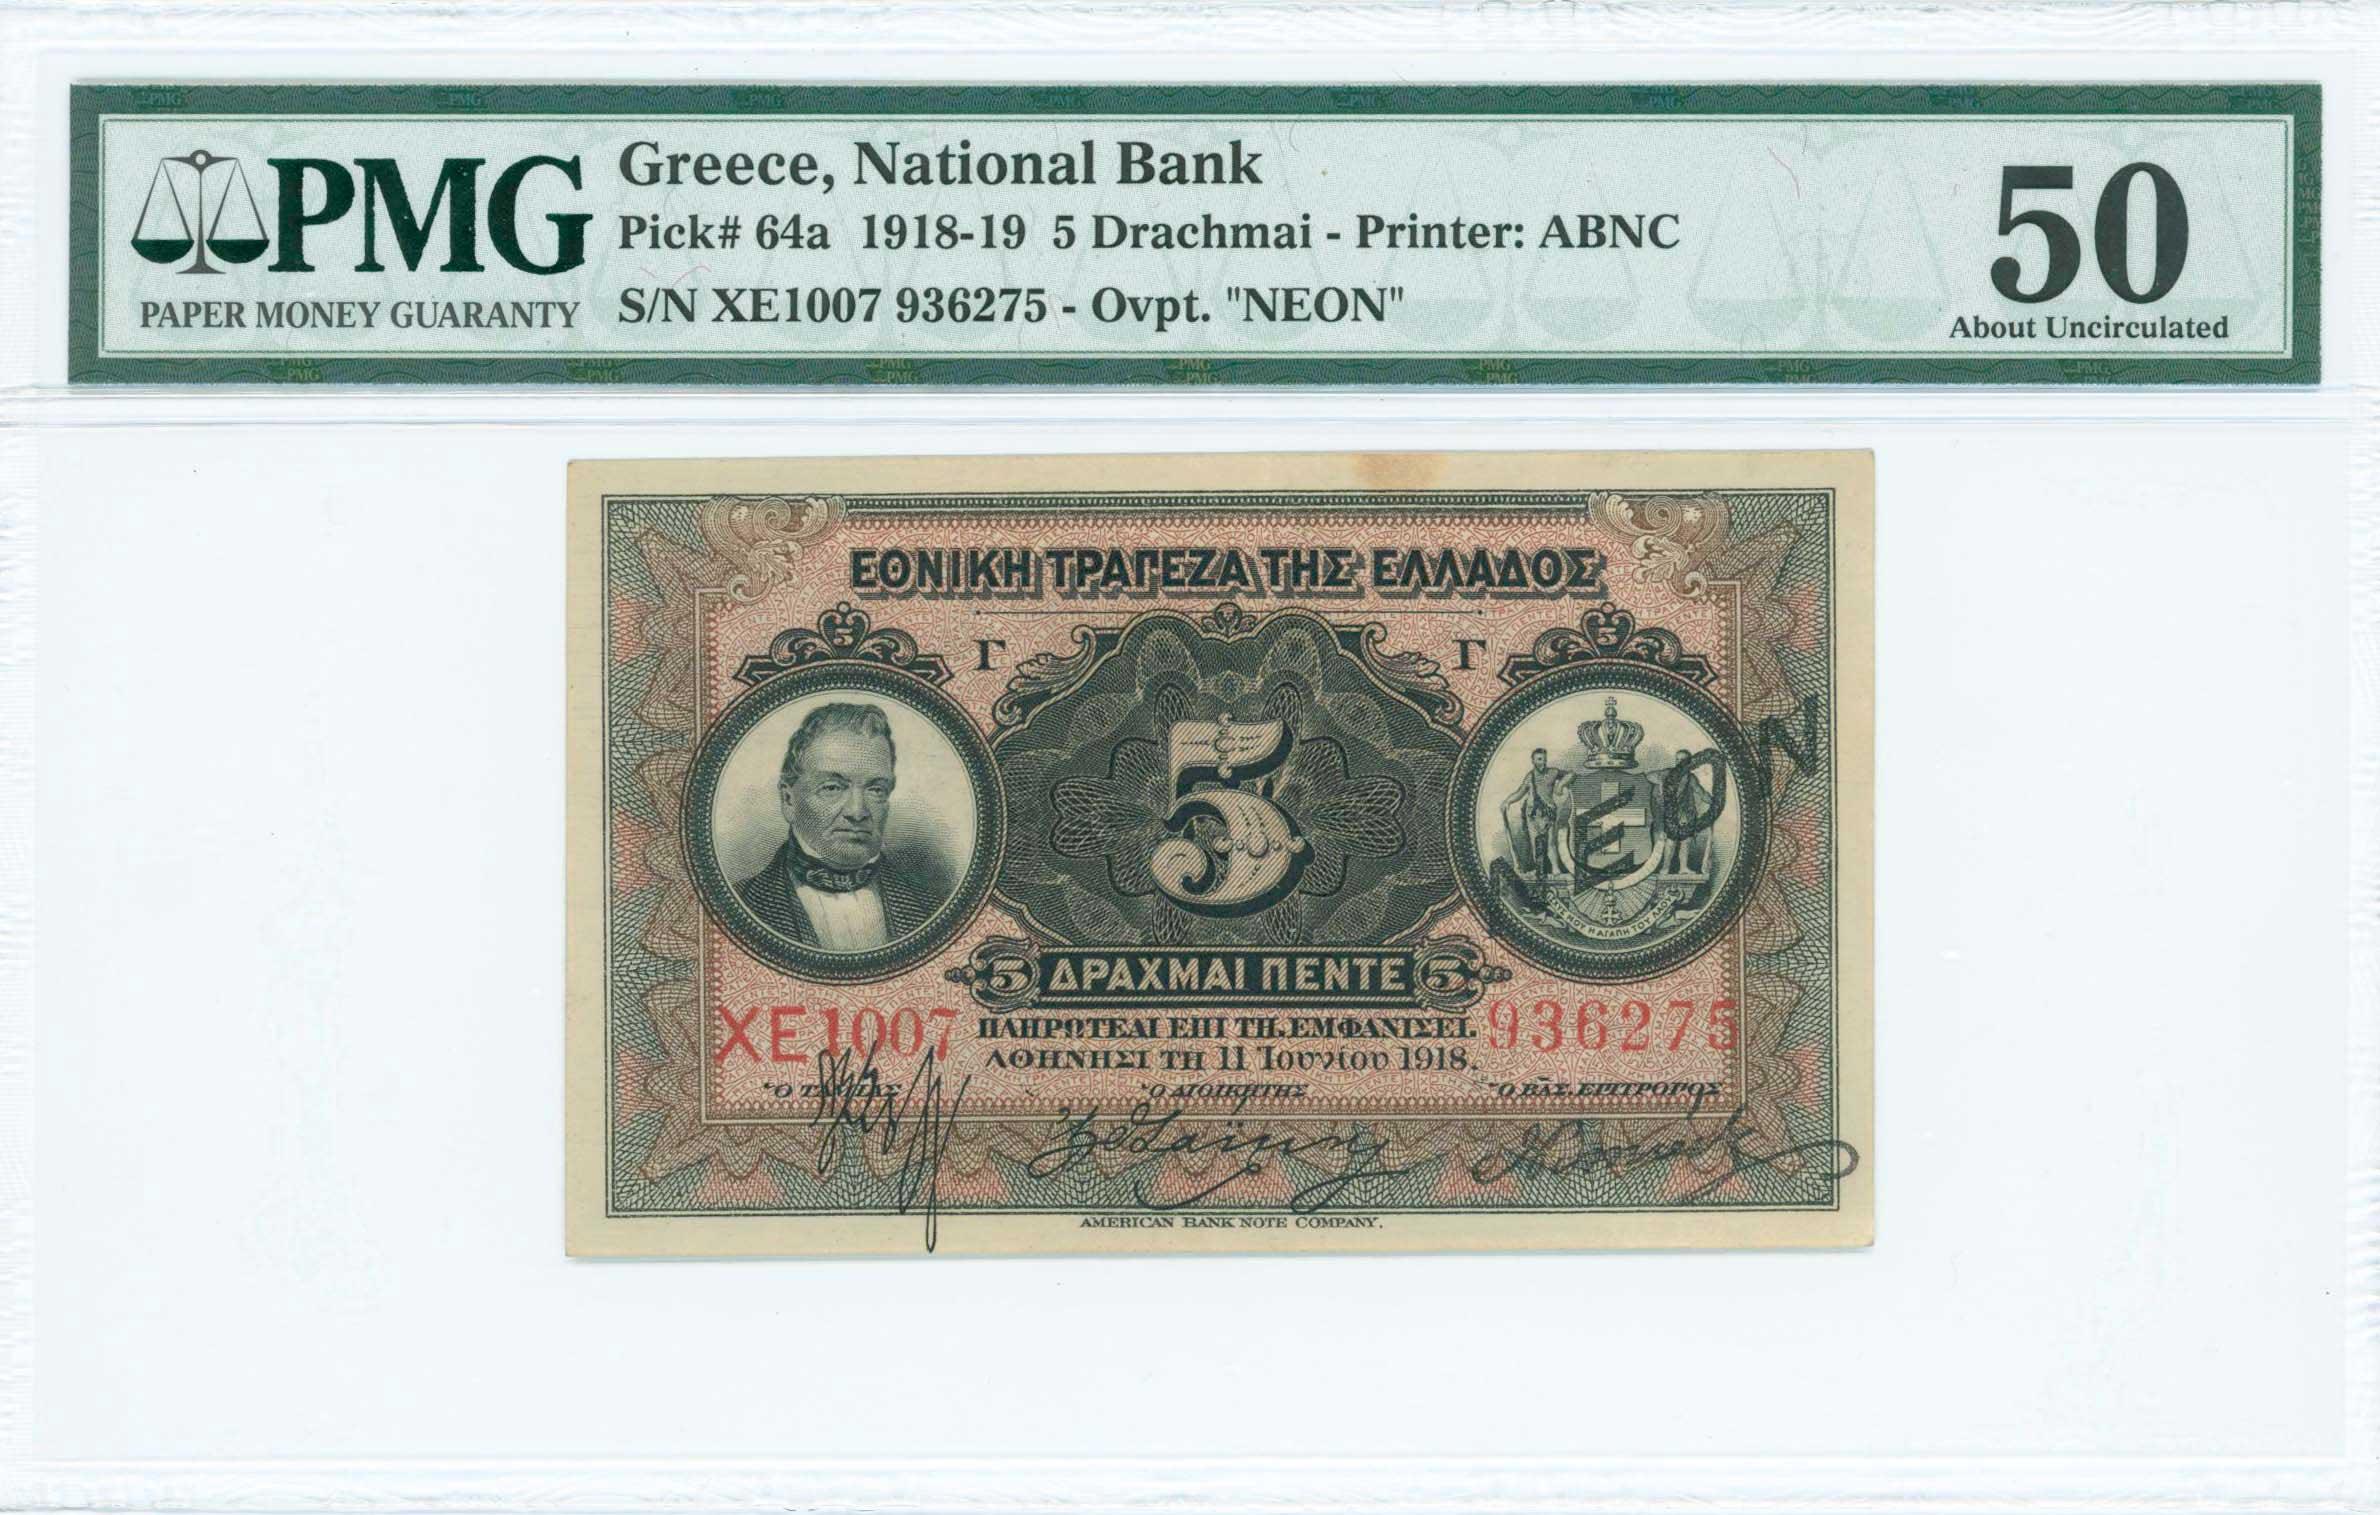 Lot 6145 - -  PAPER MONEY - BANKNOTES National Bank of Greece -  A. Karamitsos Live Bid Auction Coins, Medals & Banknotes